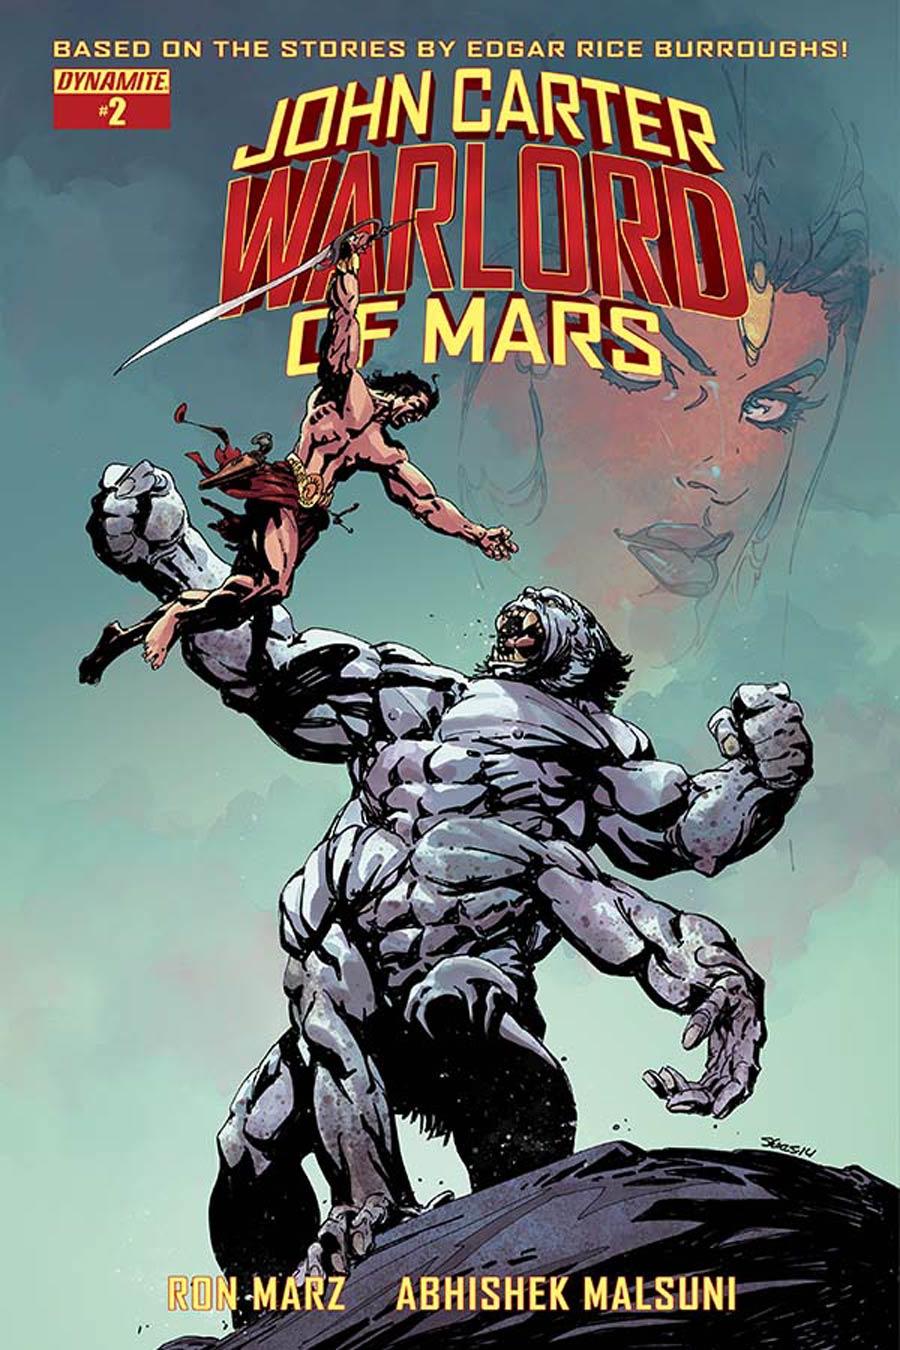 John Carter Warlord Of Mars Vol 2 #2 Cover B Variant Bart Sears Cover